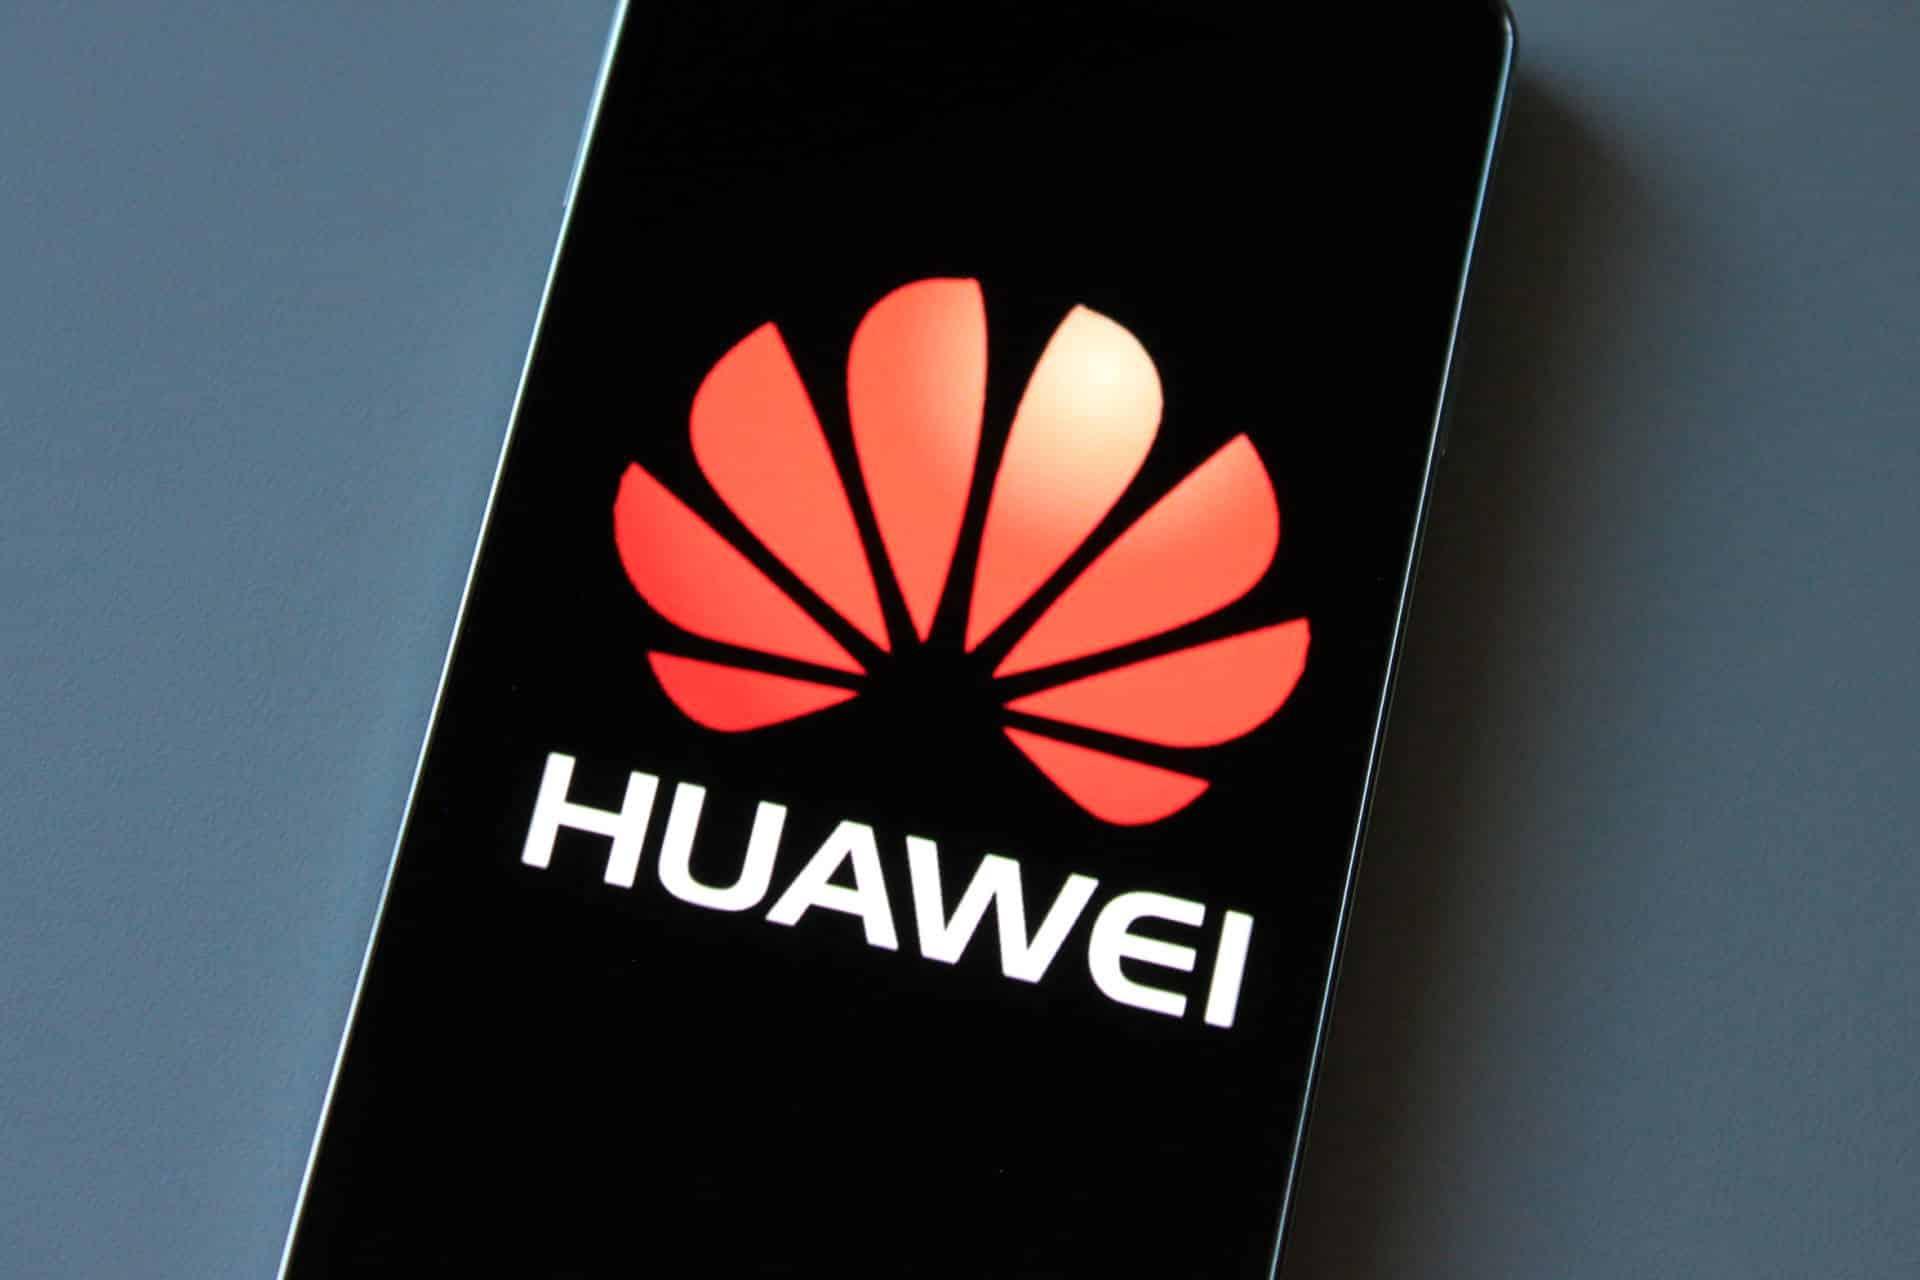 Huawei Blacklisting